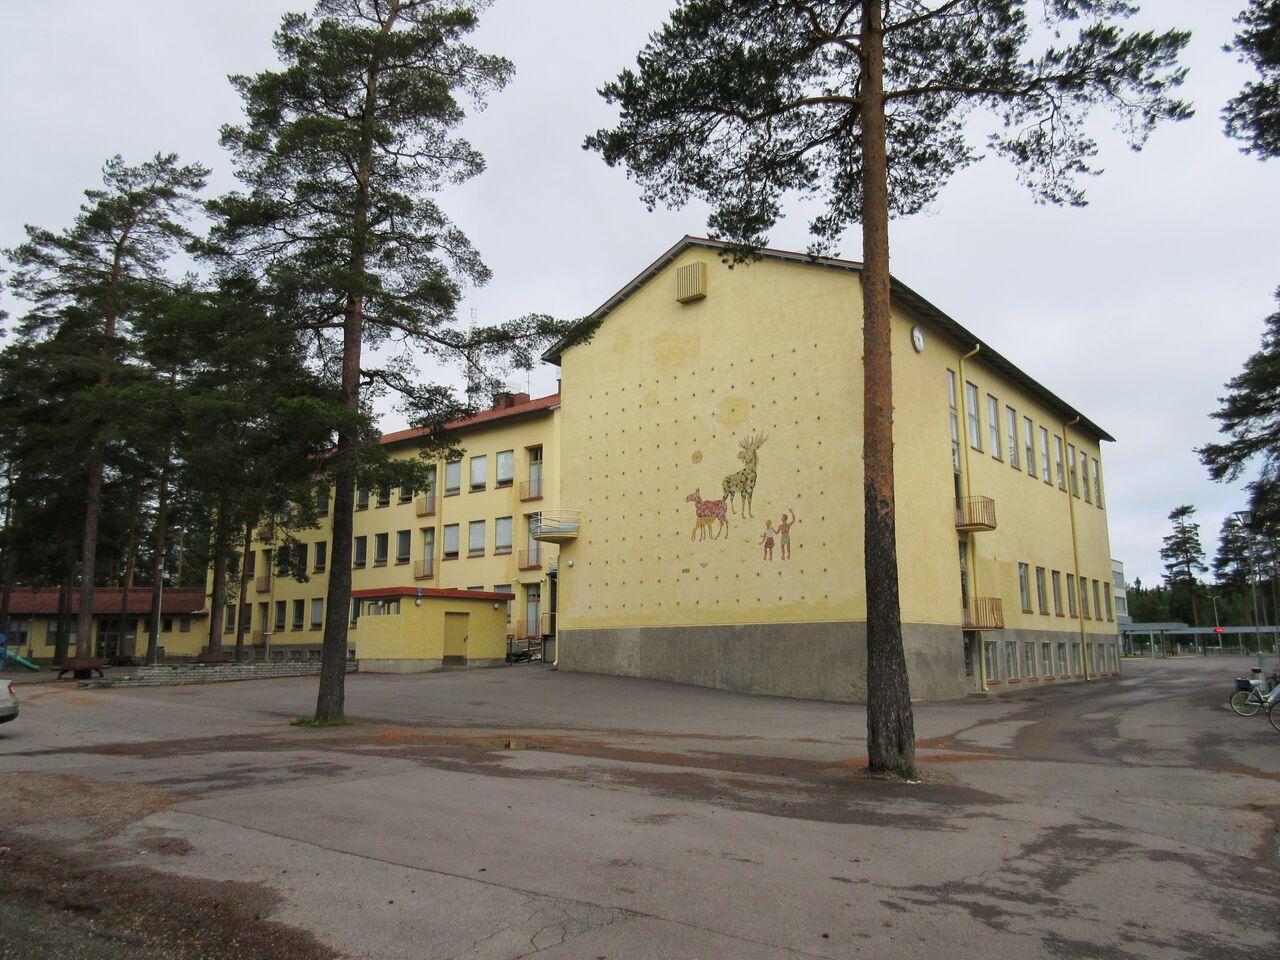 karpasen_koulu